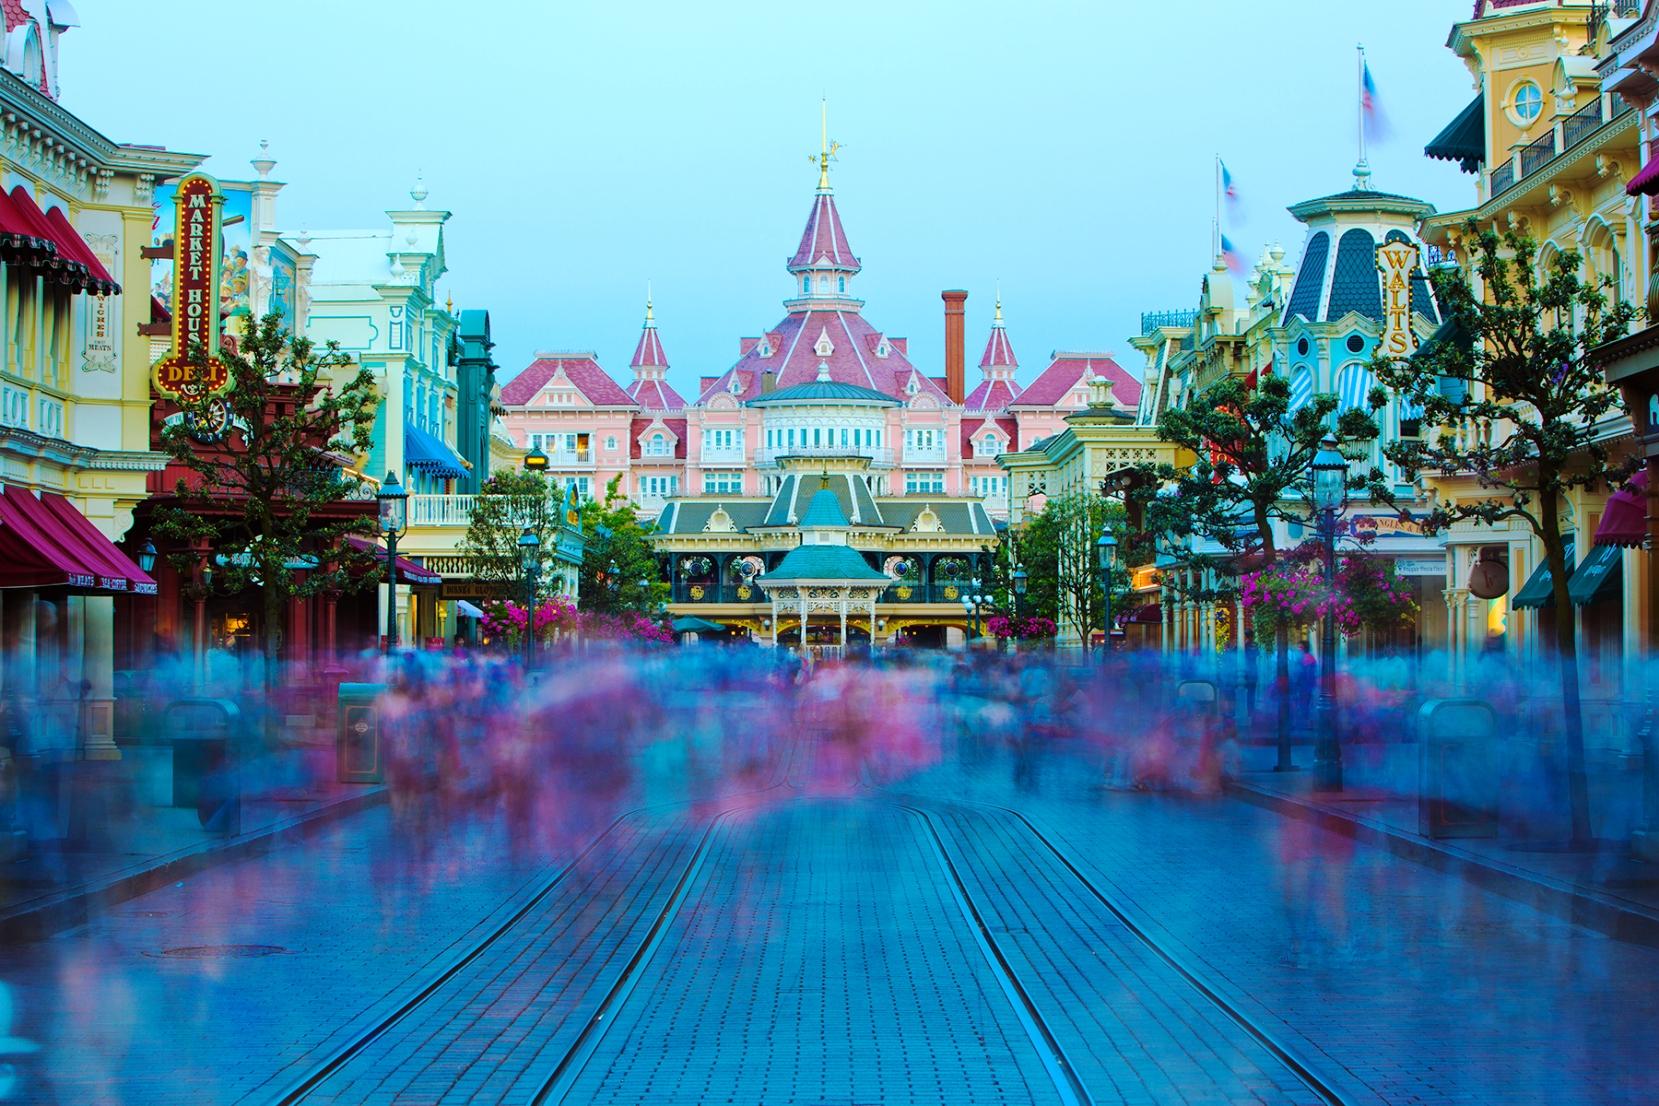 Main Street U.S.A. in Disneyland Park - Foto: (c) Disney